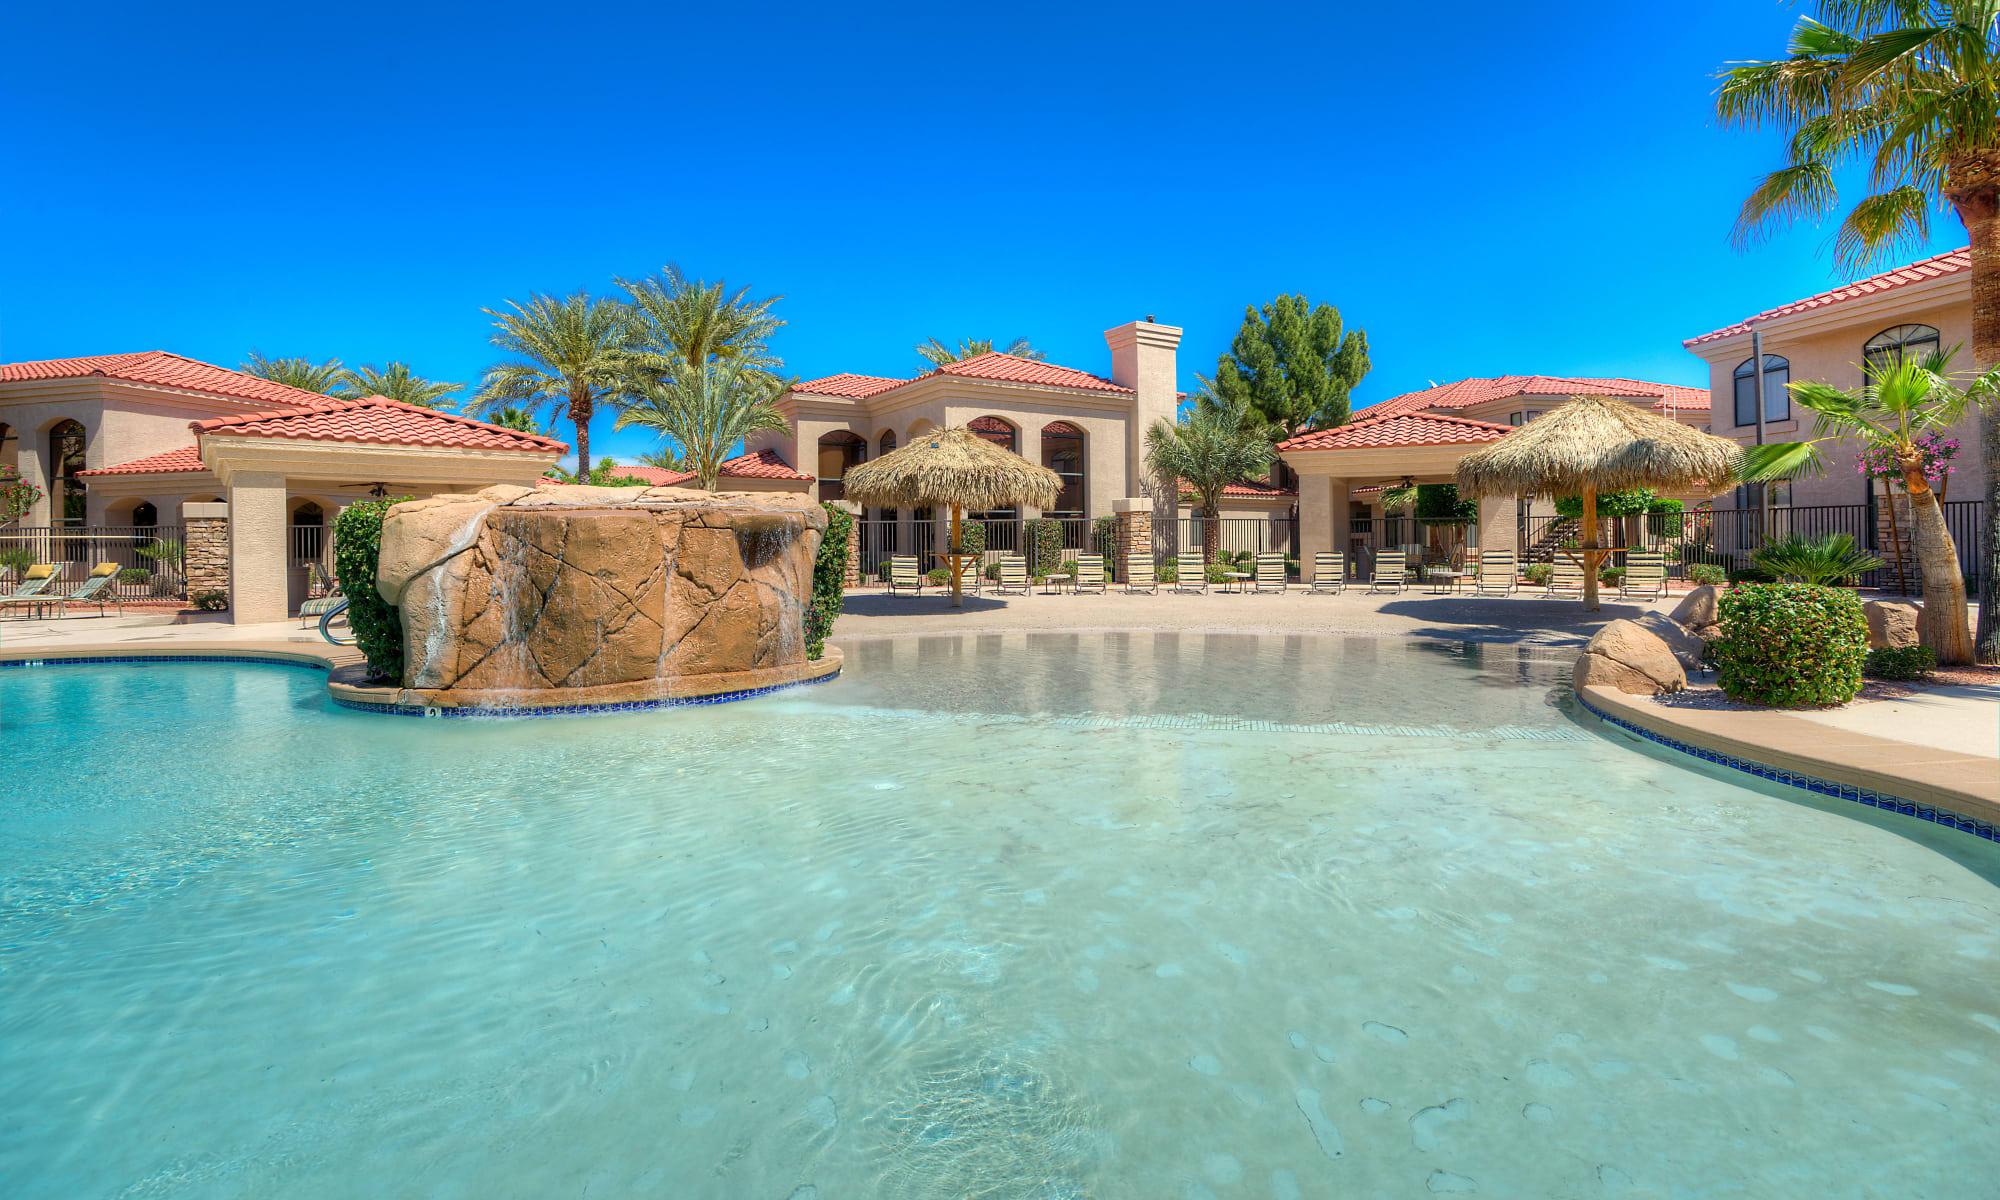 Apartments at San Lagos in Glendale, Arizona